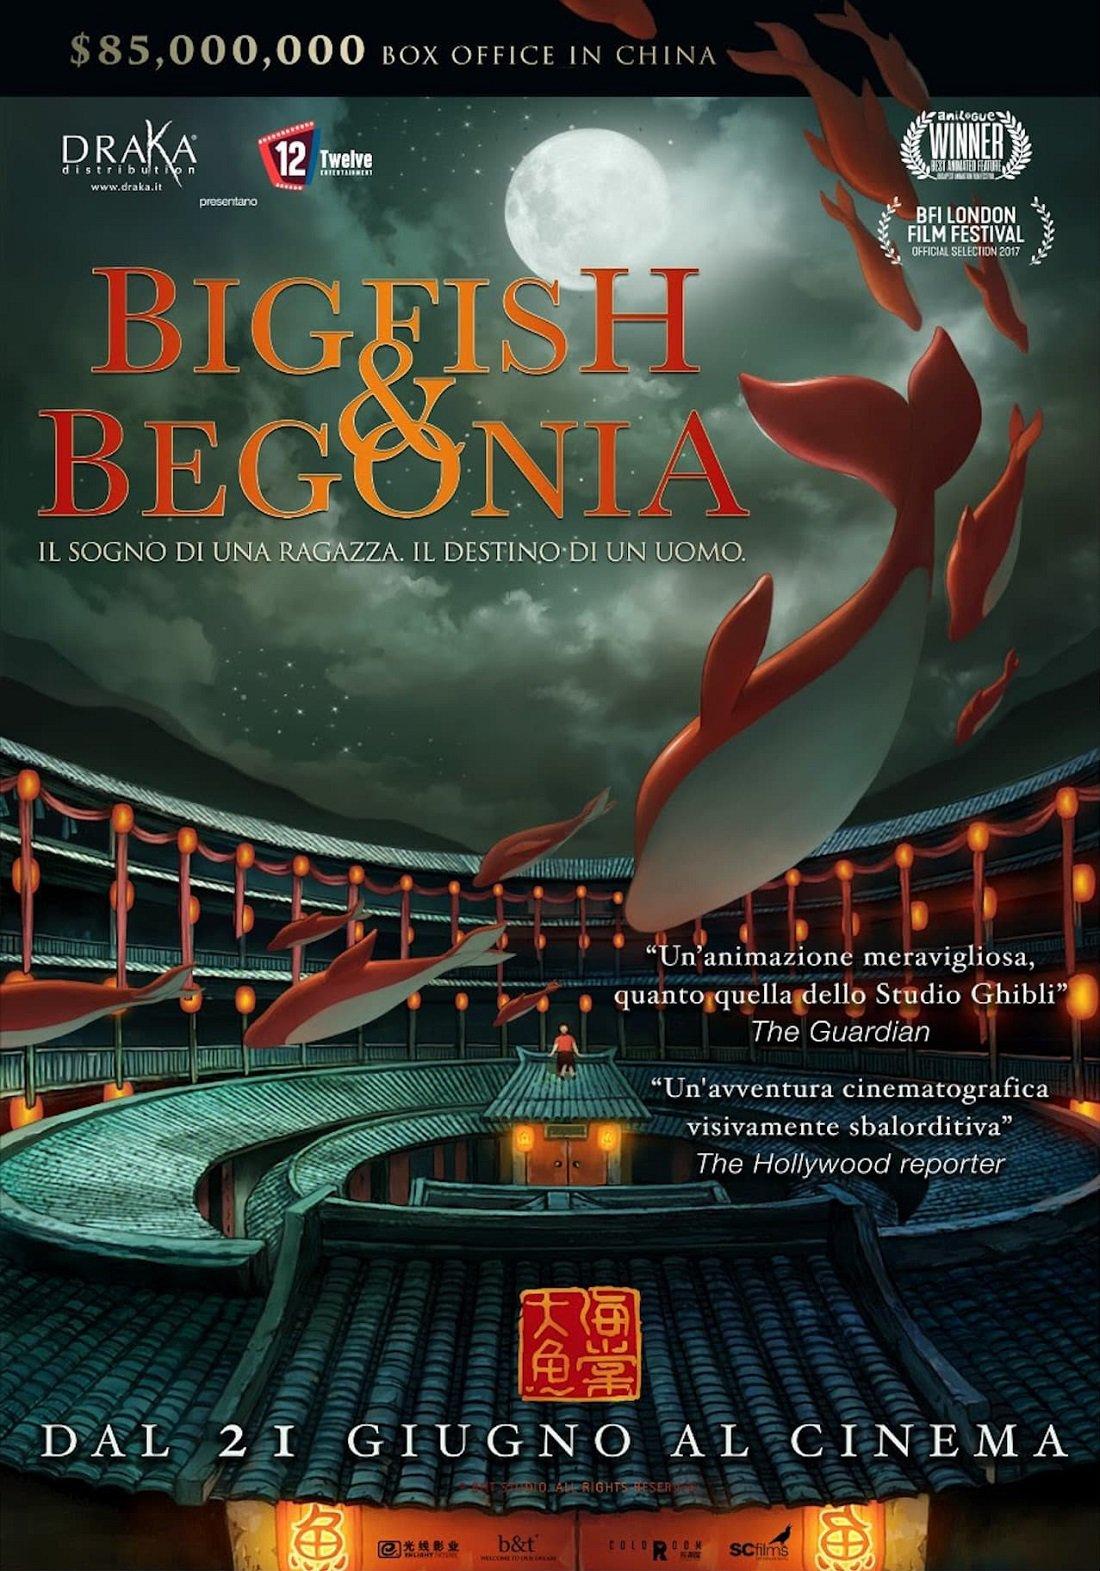 Big fish & begonia (da hai)